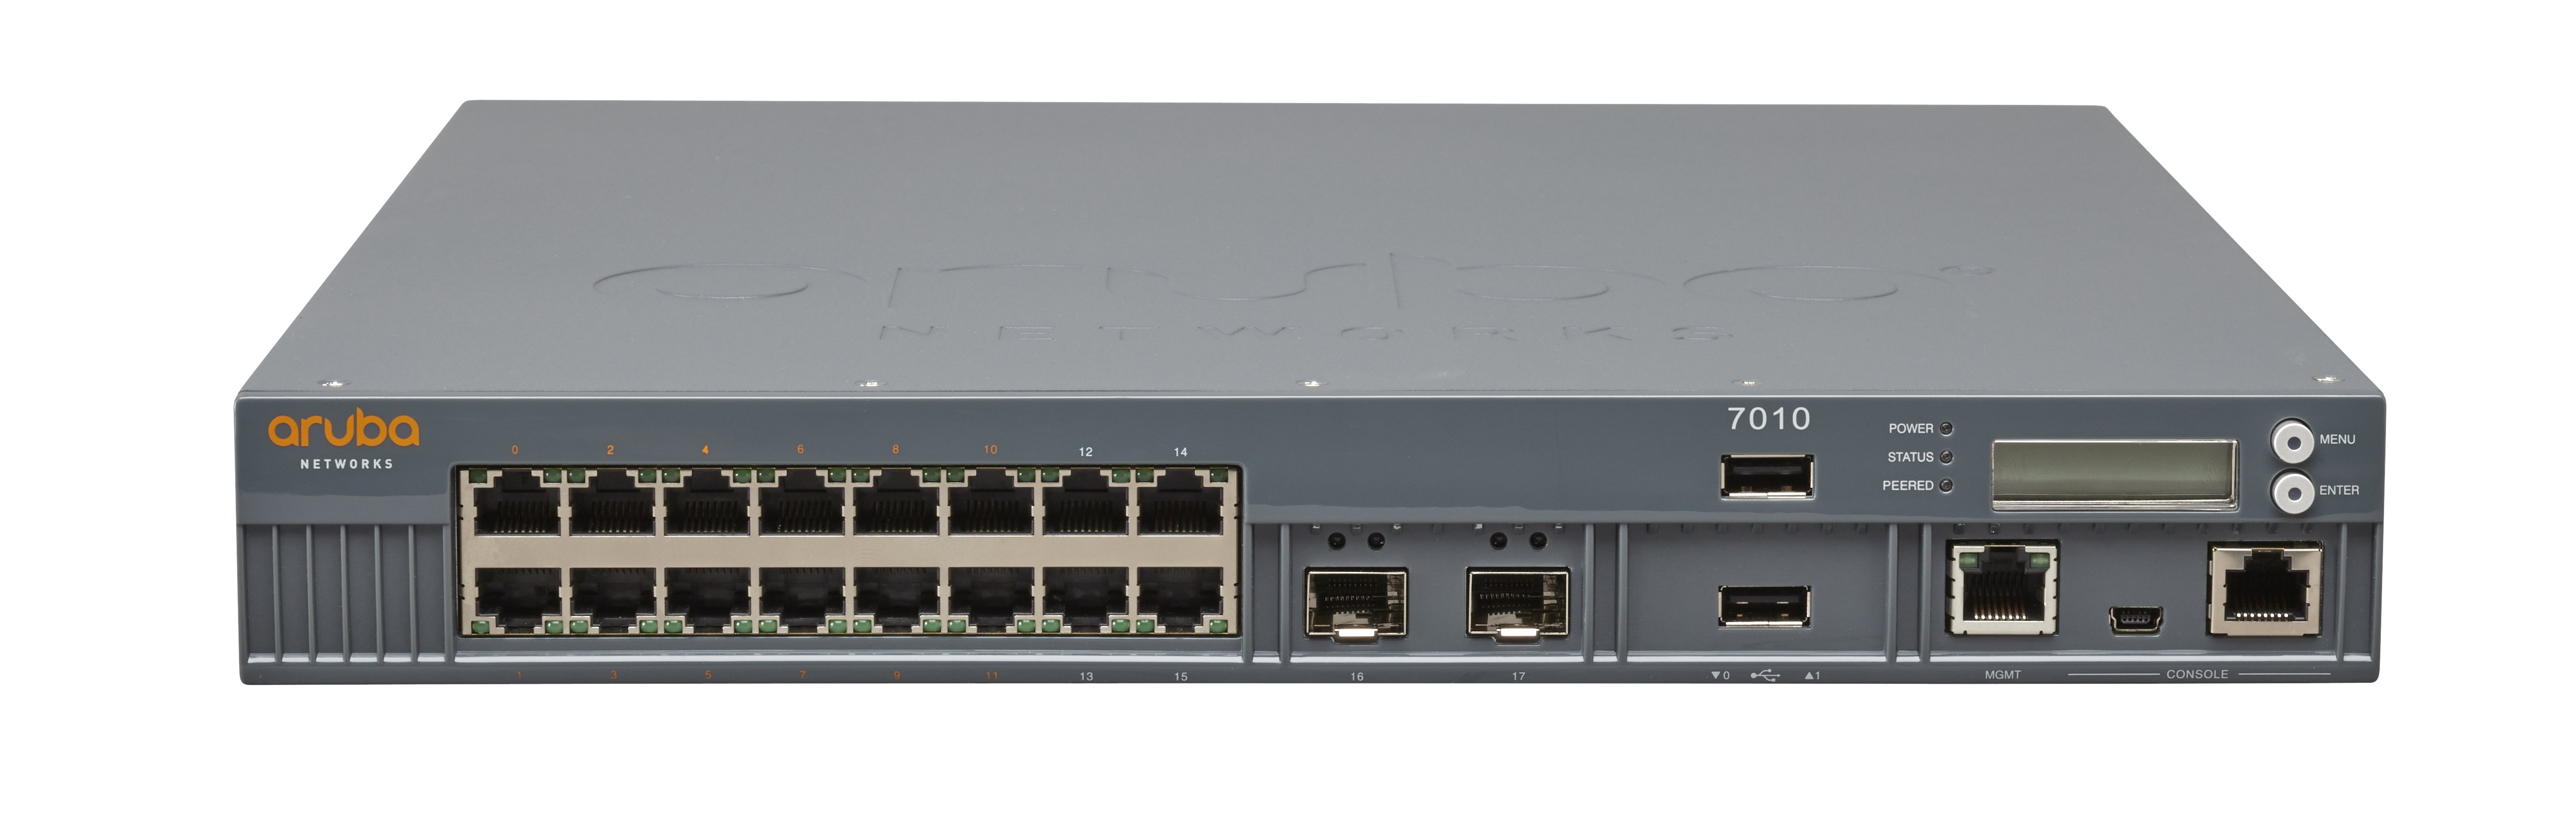 HPE JW678A 7010 16-Port GbE PoE PoE+ Controller - ราคา และ